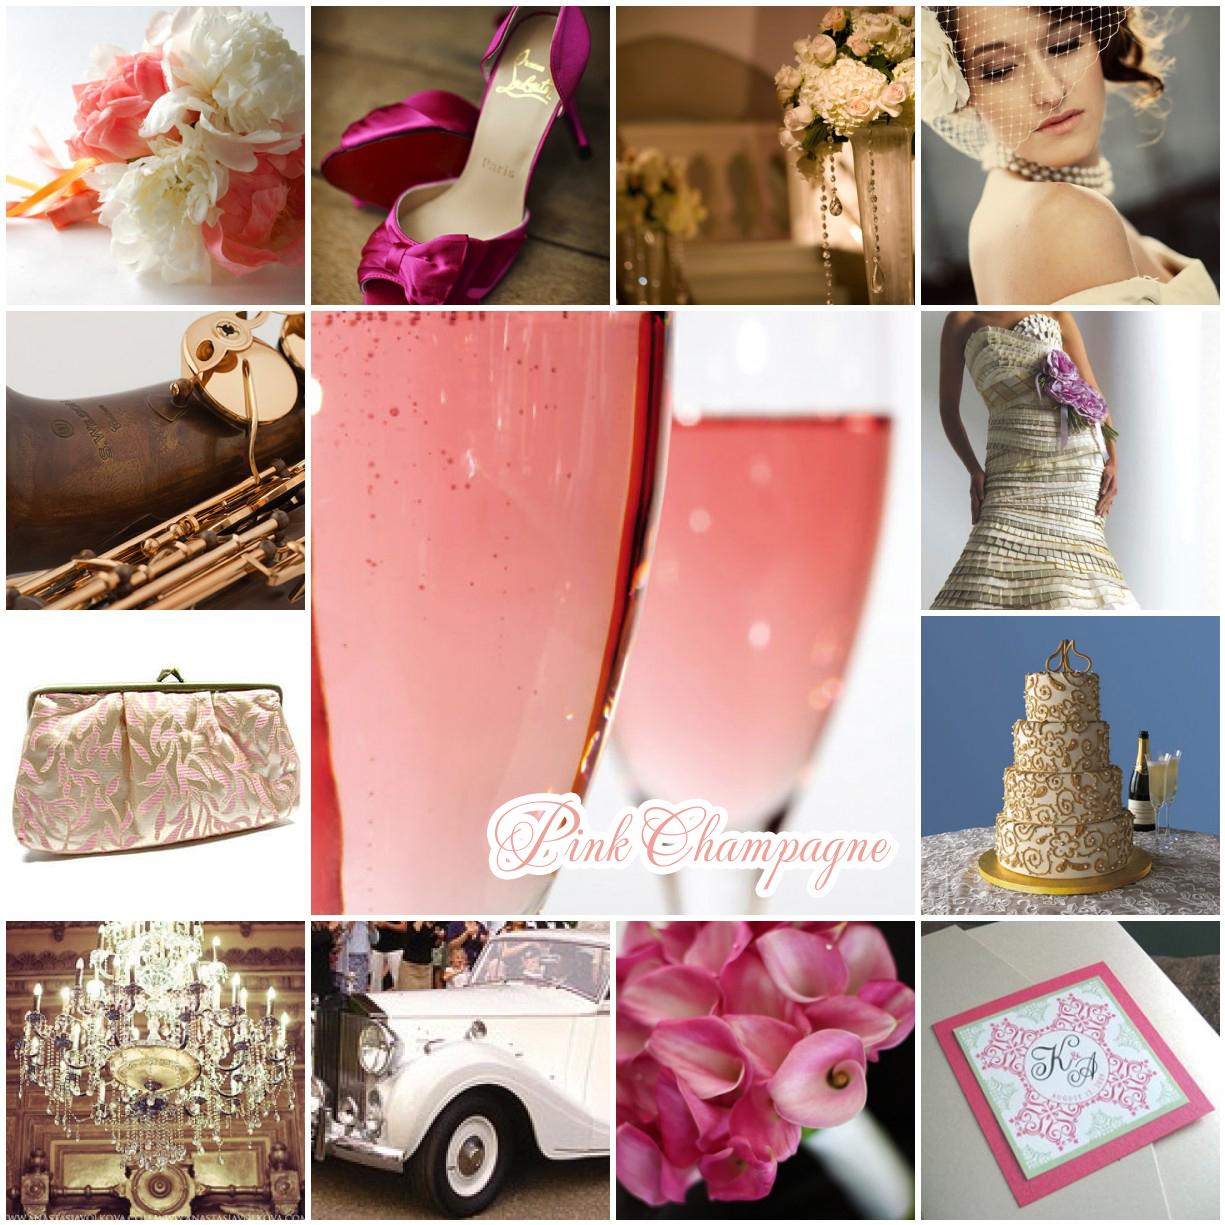 Sparkling Events Amp Designs Wedding Inspiration Pink Champagne Inspiration Board